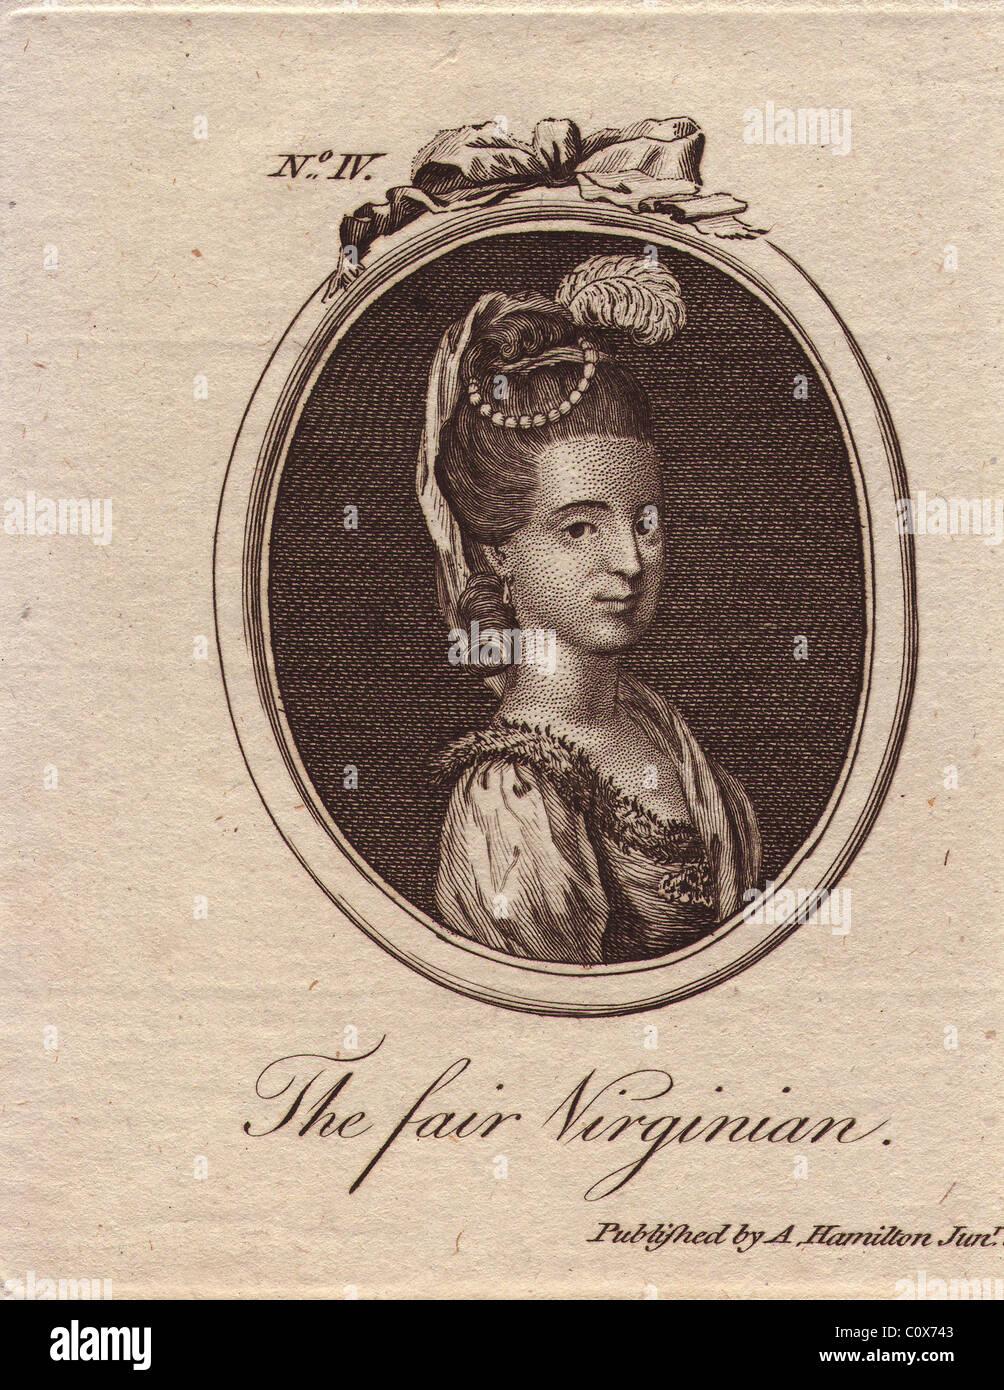 The Fair Virginian, mysterious 18th century beauty. - Stock Image